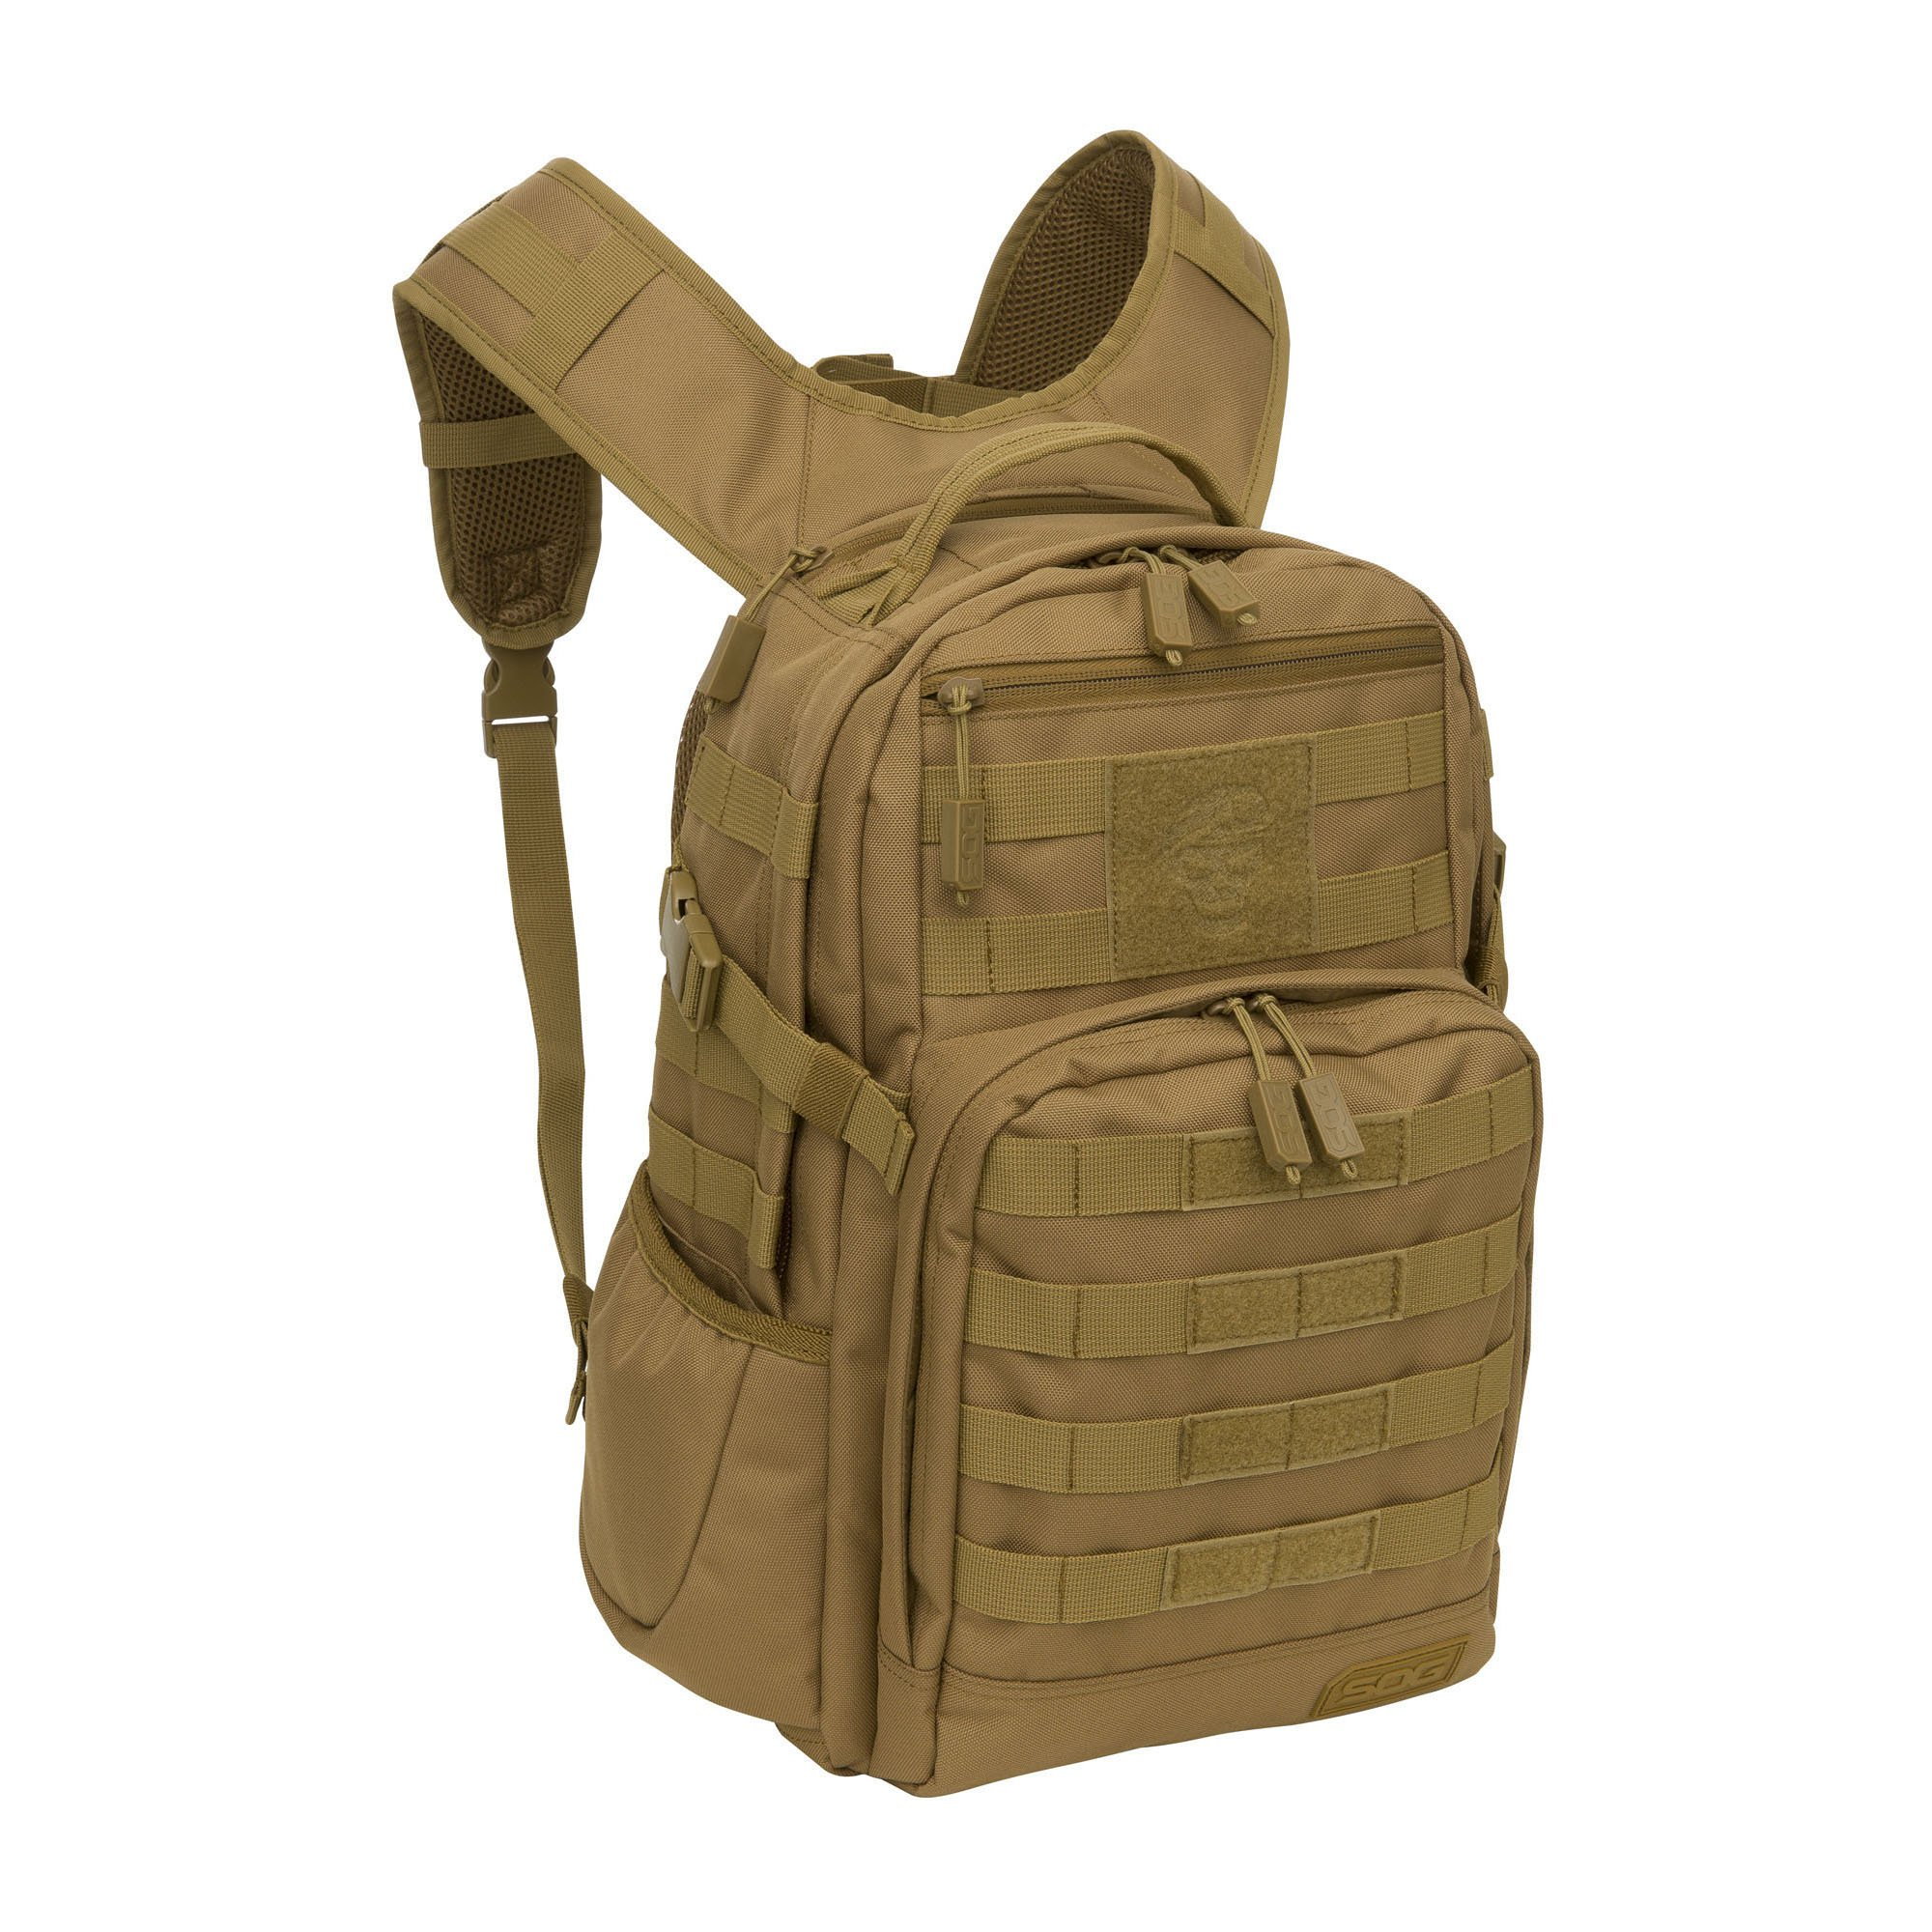 SOG Ninja Tactical Day Pack, 24.2-Liter, Clay Brown